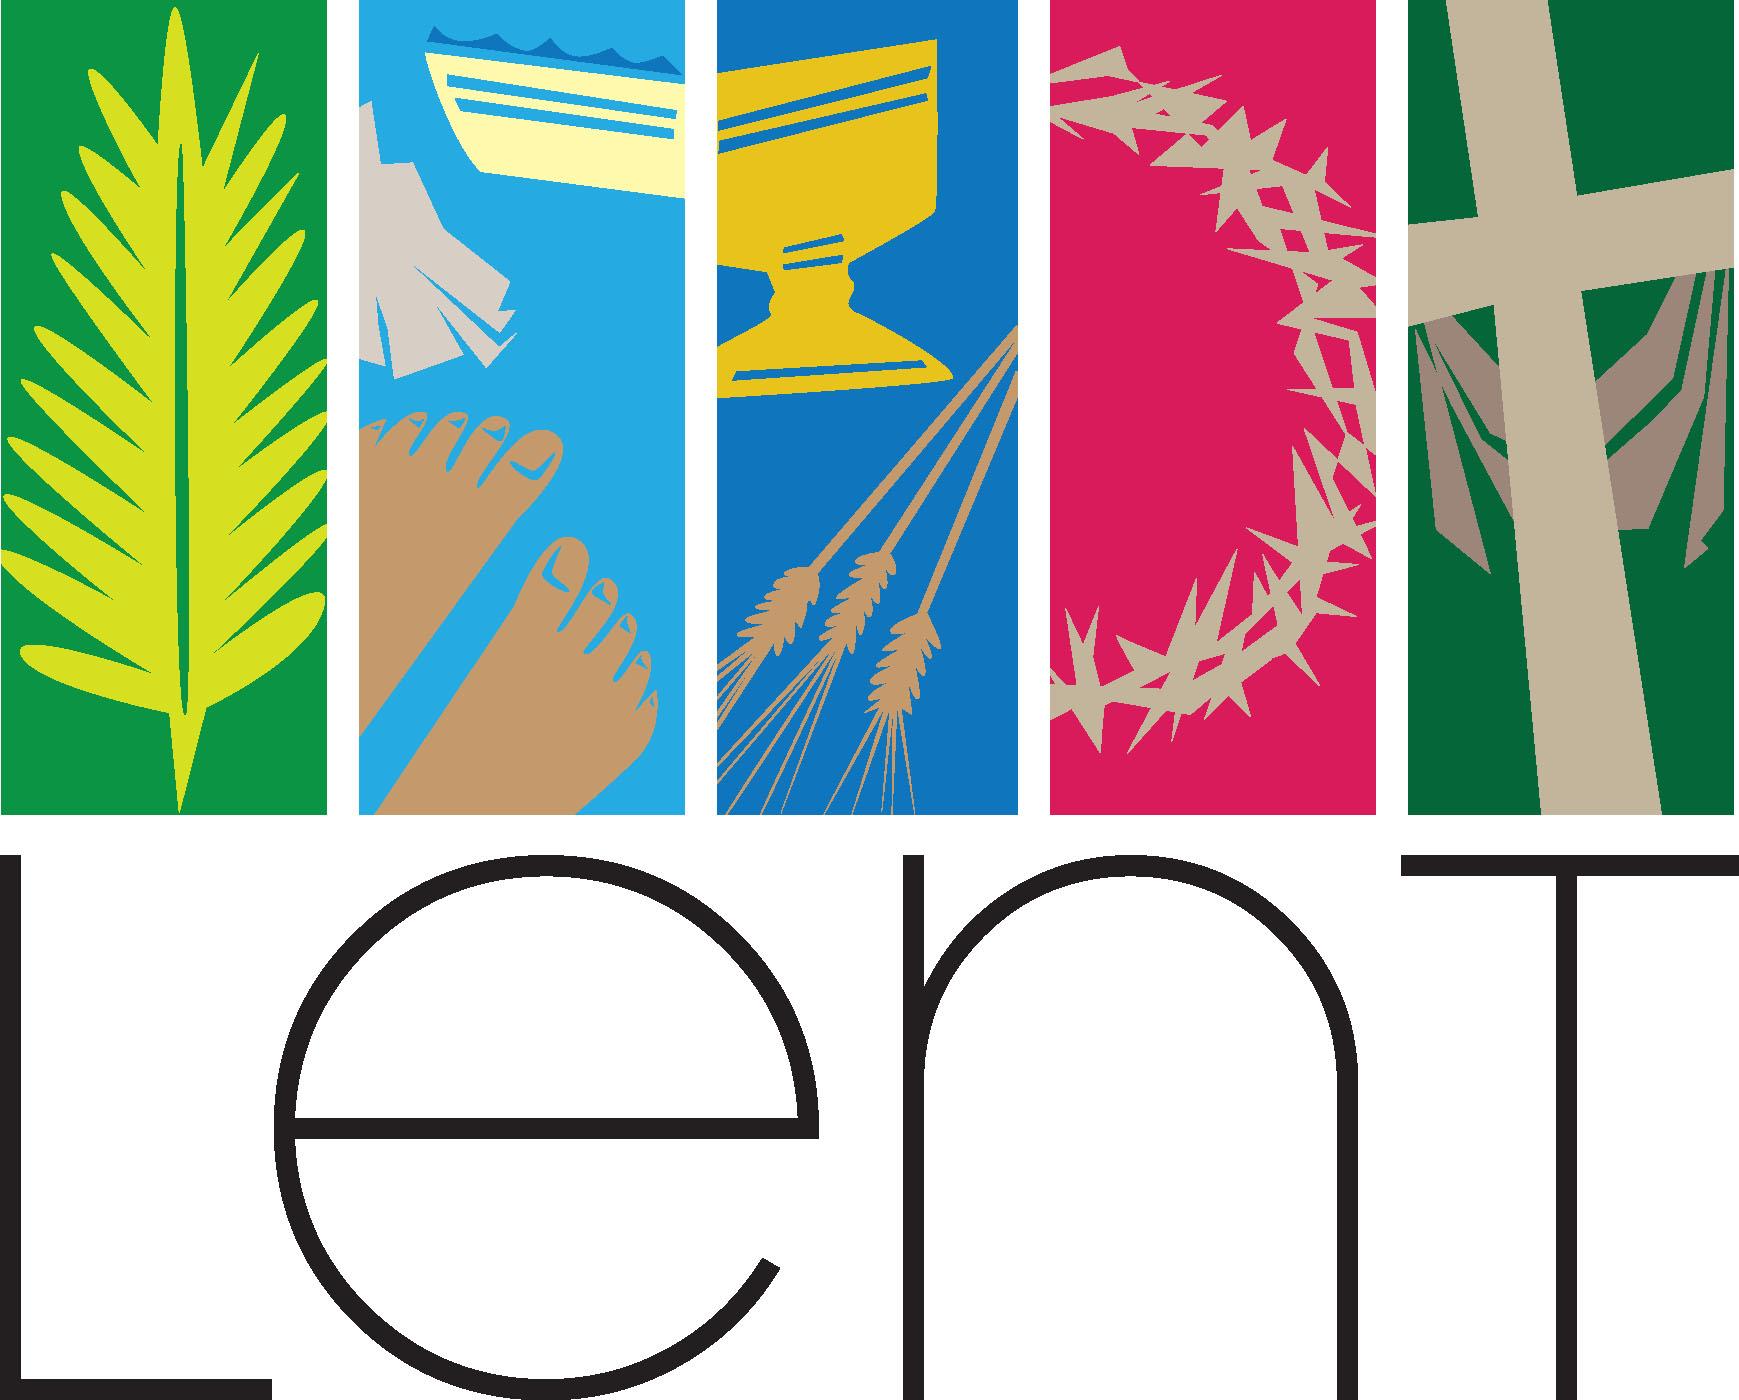 Library clipart bibliotheque Online Clipart Kids Online Lenten